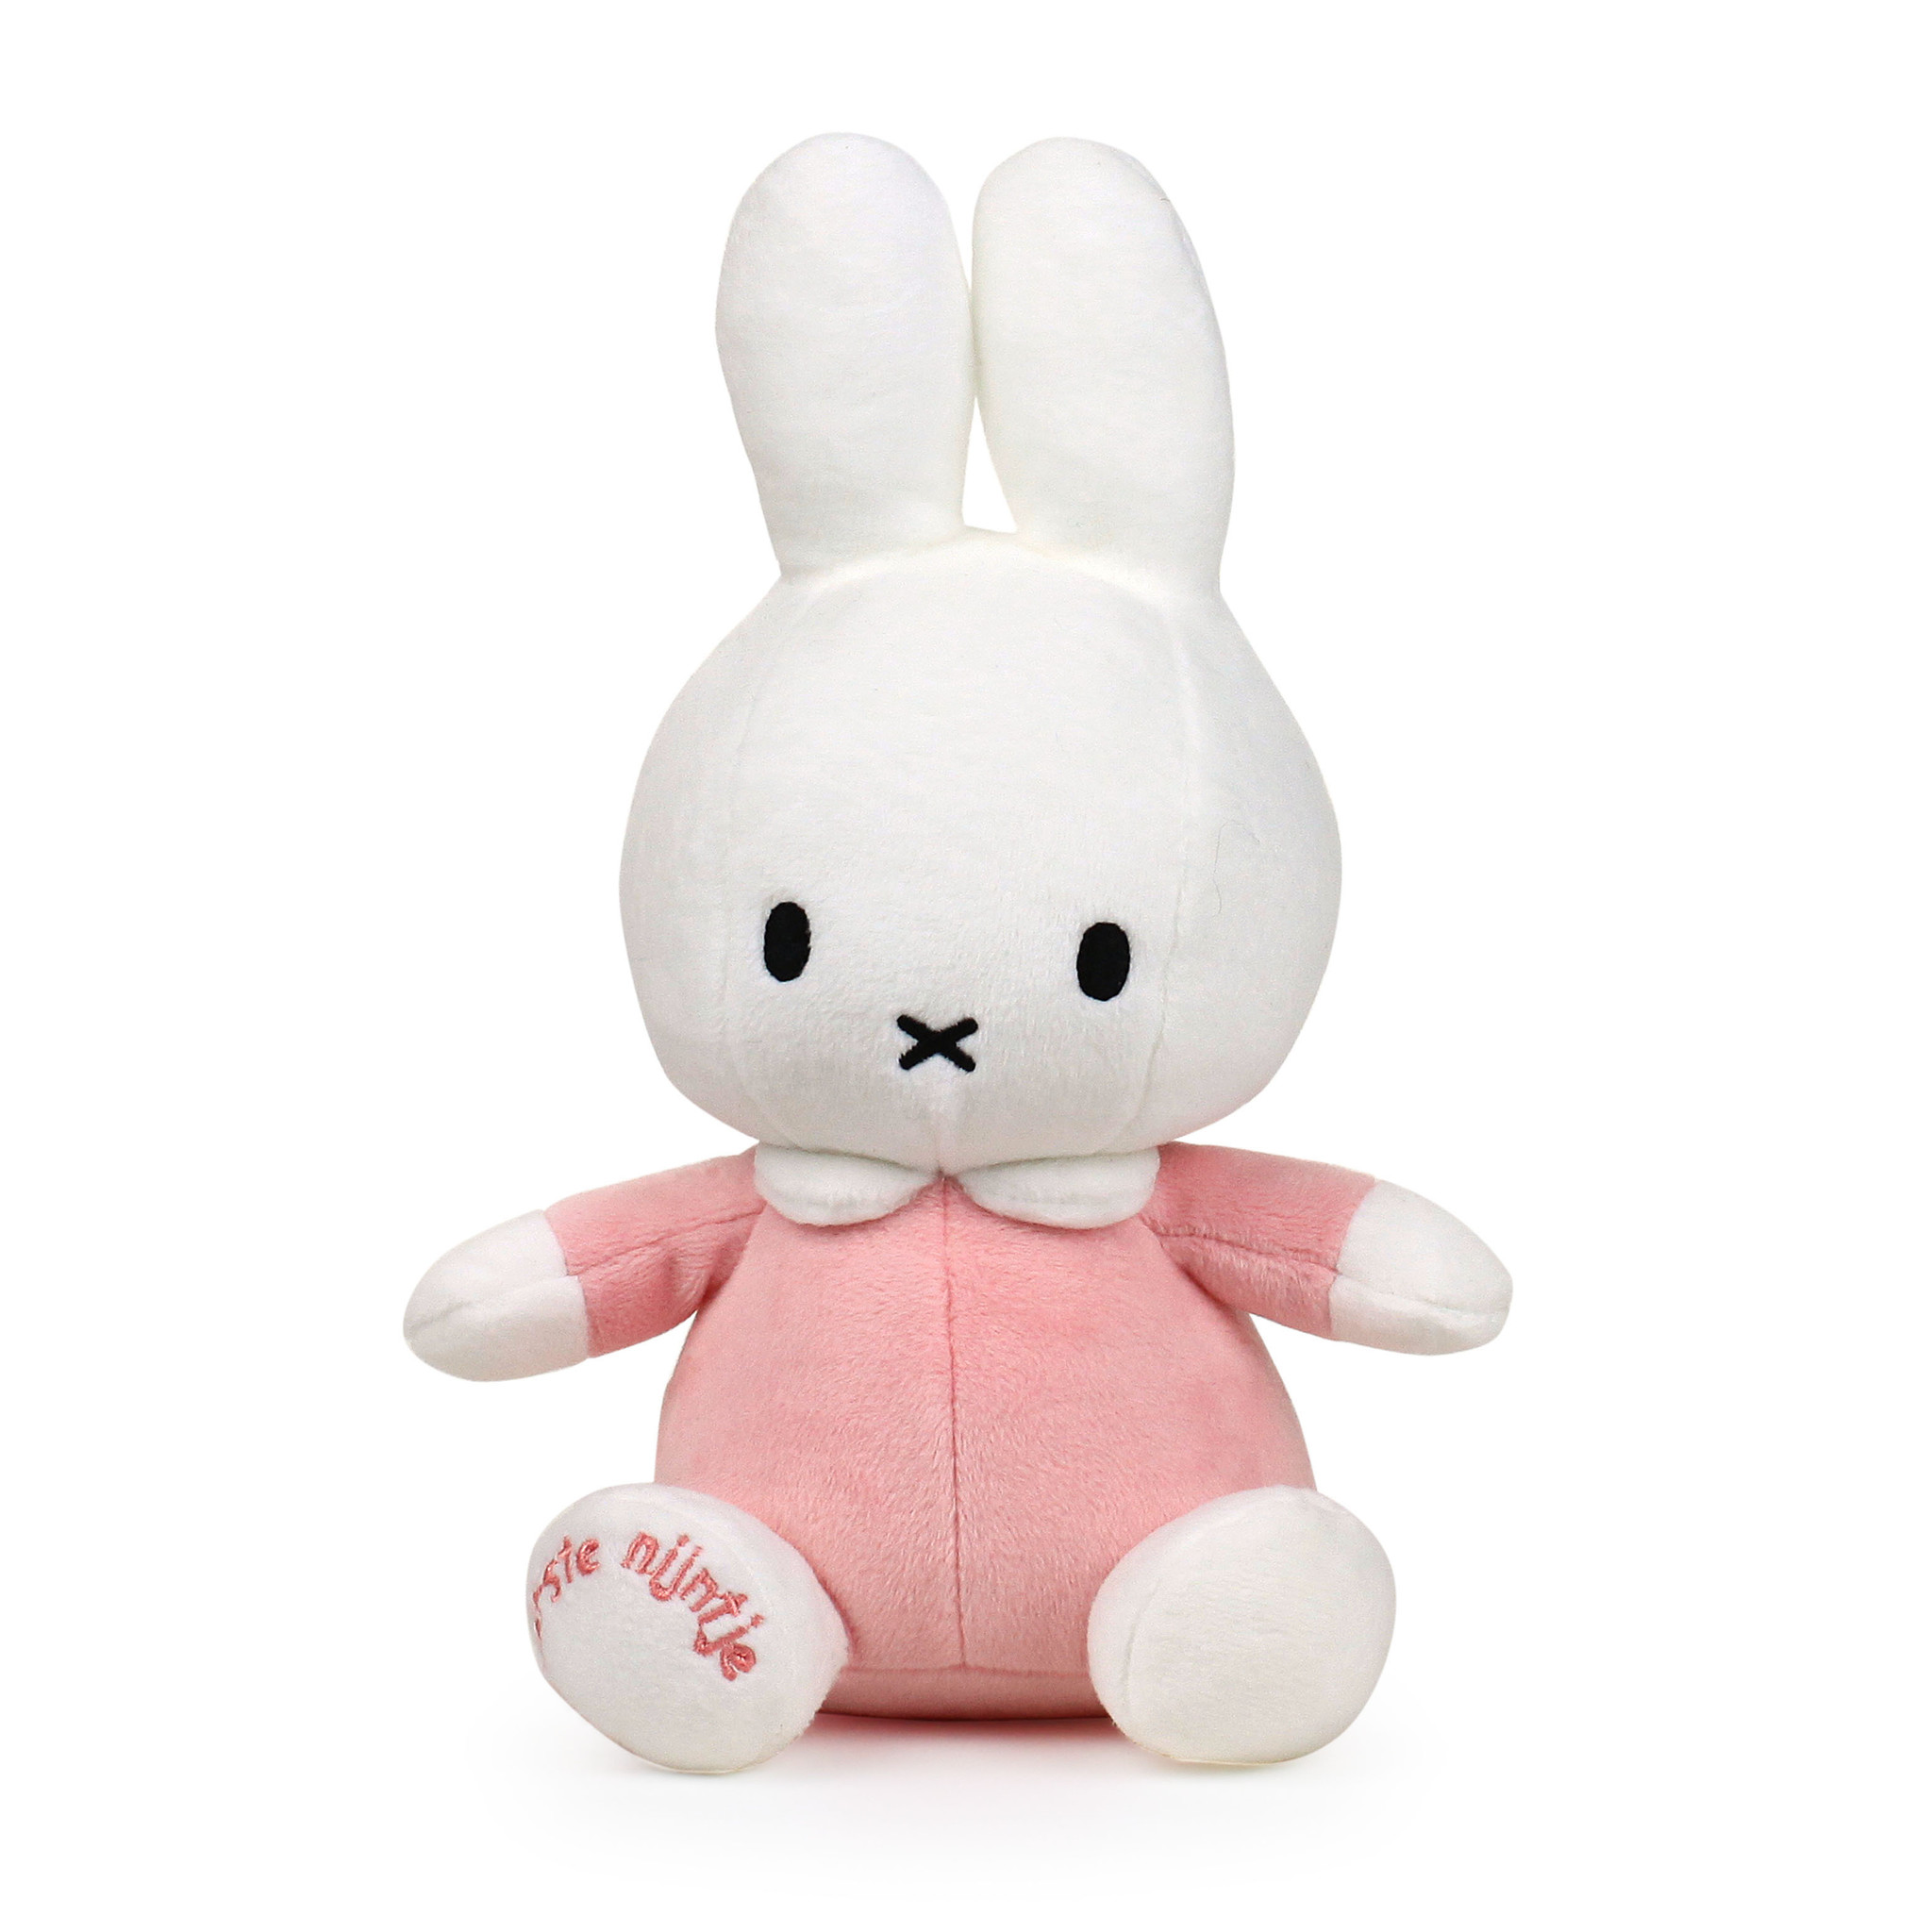 Nijntje/Miffy/Snuffy My first Miffy girl - 24 cm